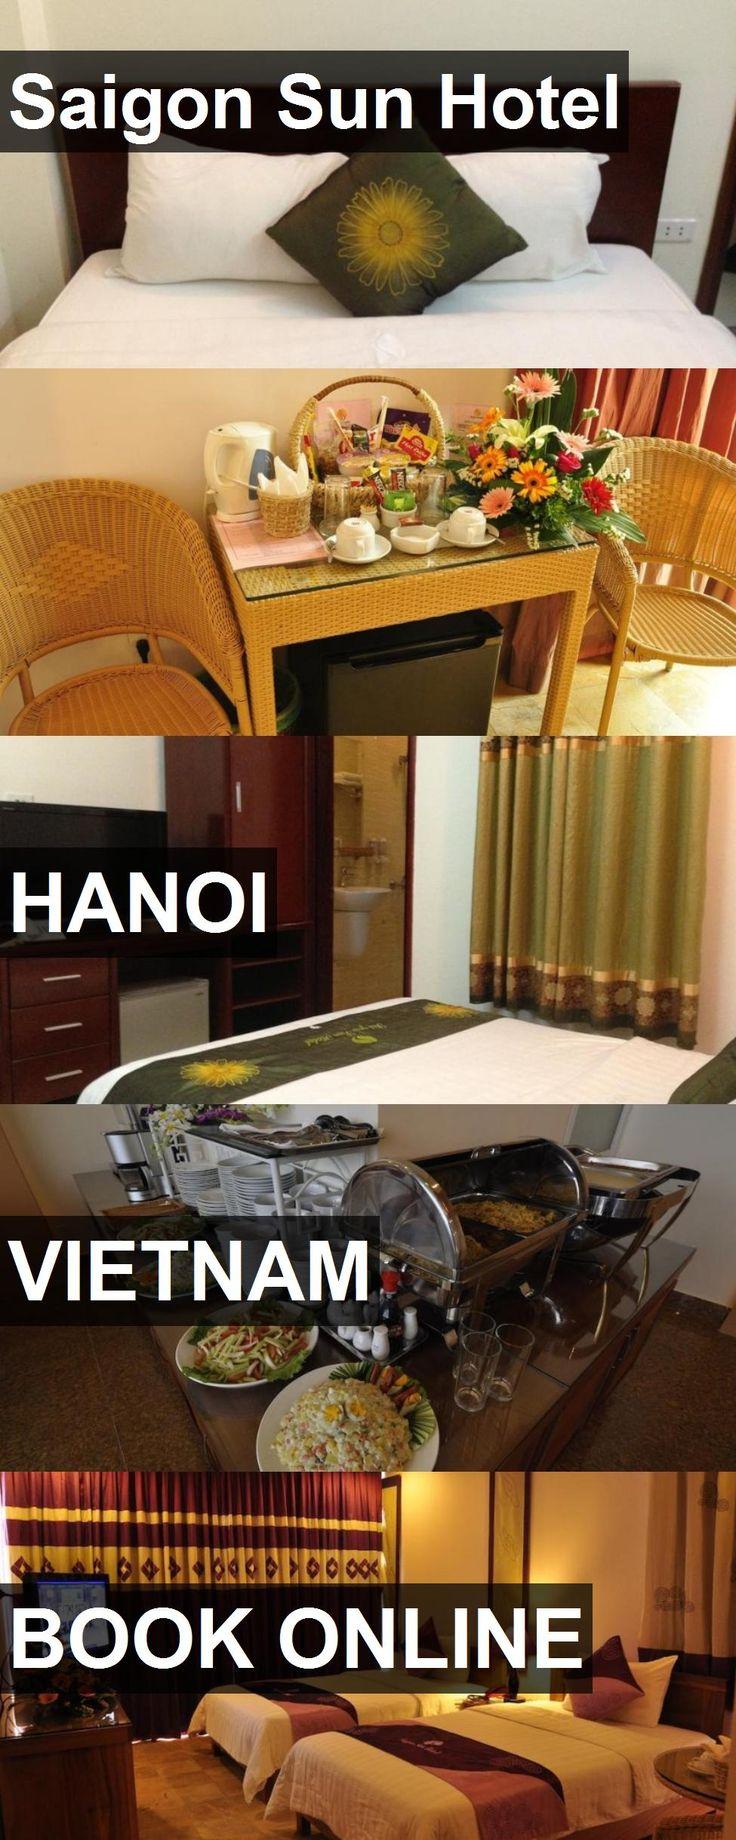 Hotel Saigon Sun Hotel in Hanoi, Vietnam. For more information, photos, reviews and best prices please follow the link. #Vietnam #Hanoi #SaigonSunHotel #hotel #travel #vacation